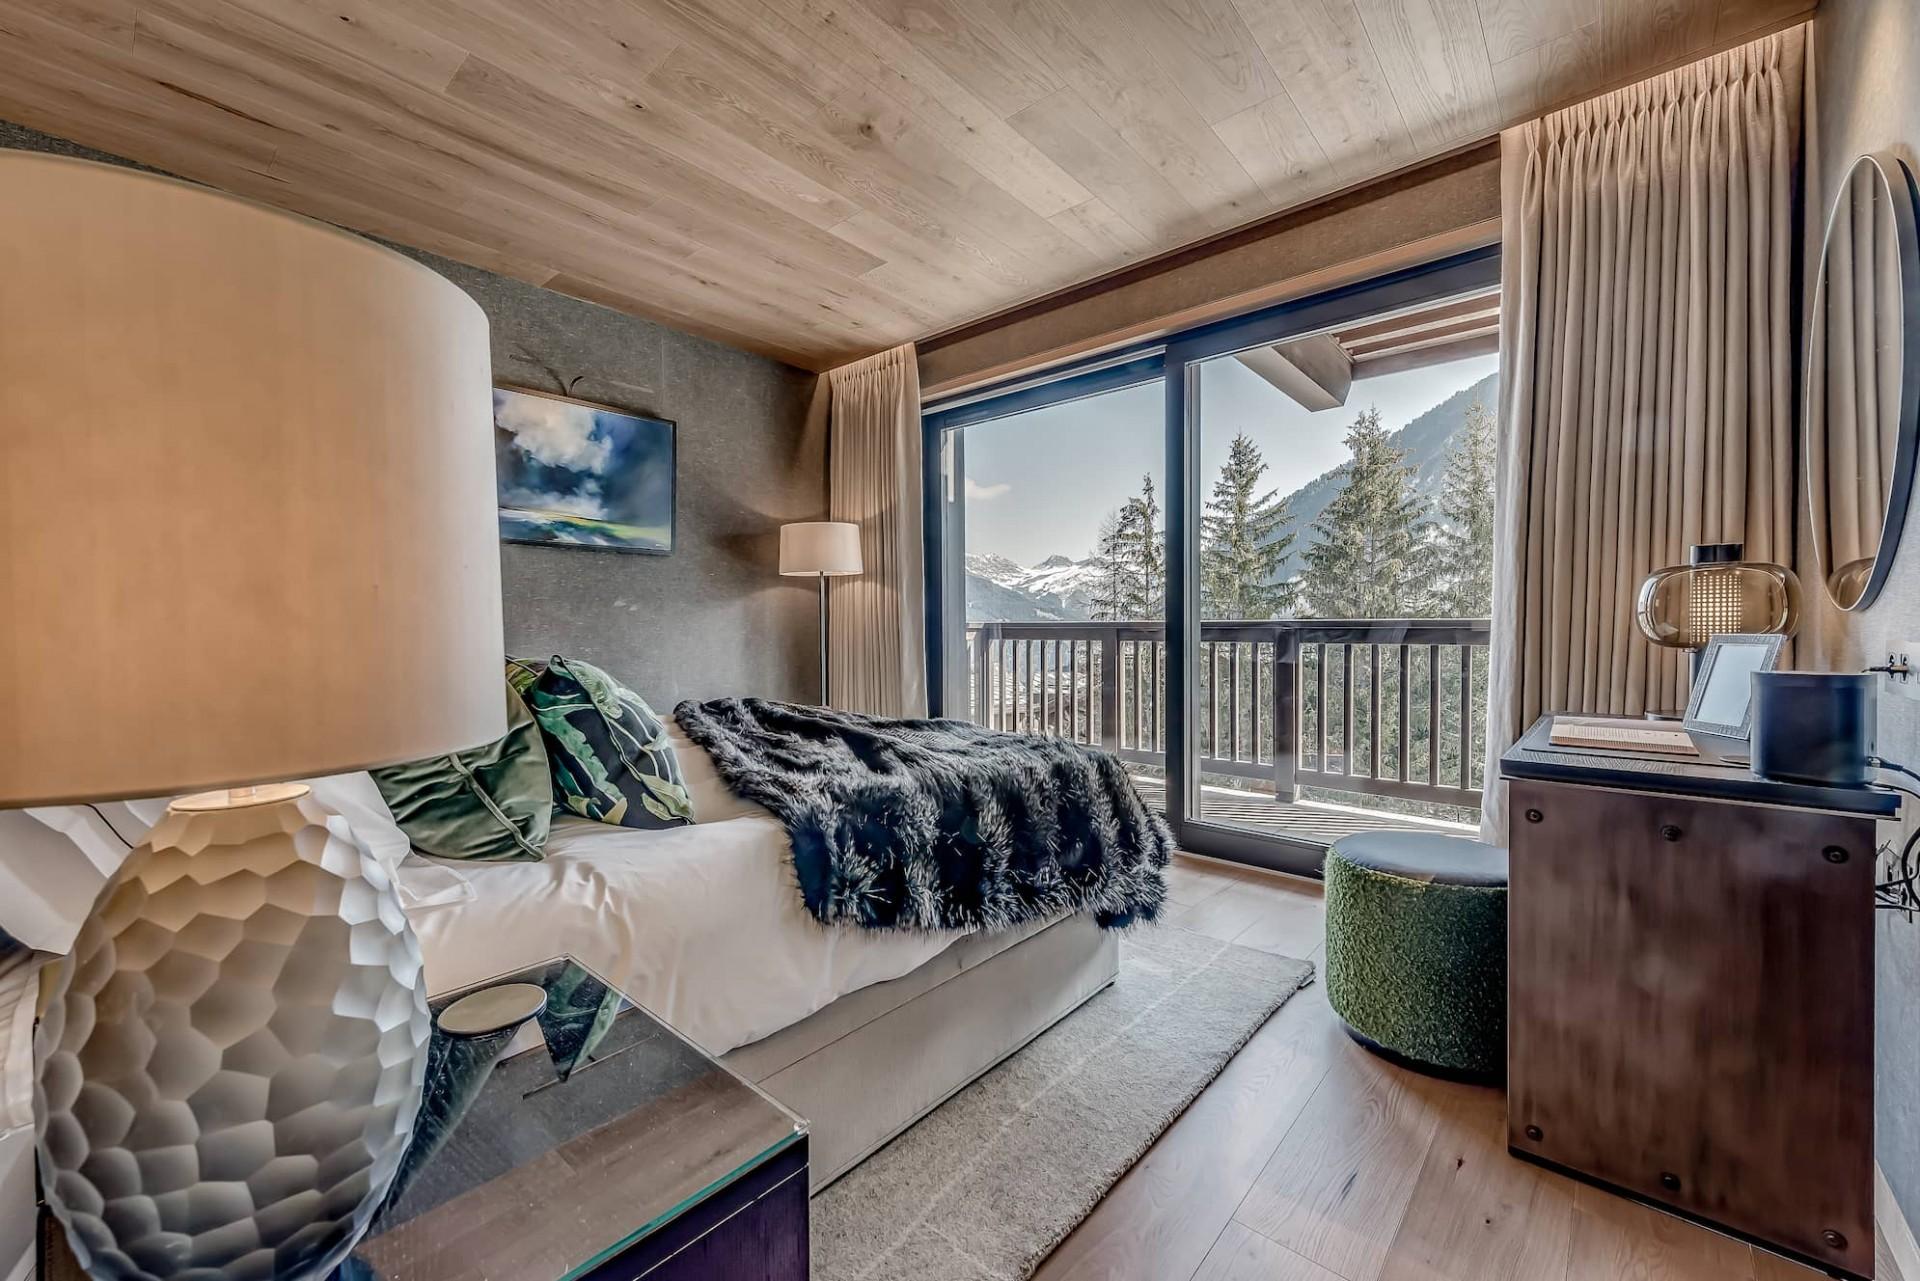 Courchevel 1650 Luxury Rental Chalet Elana Bedroom 2